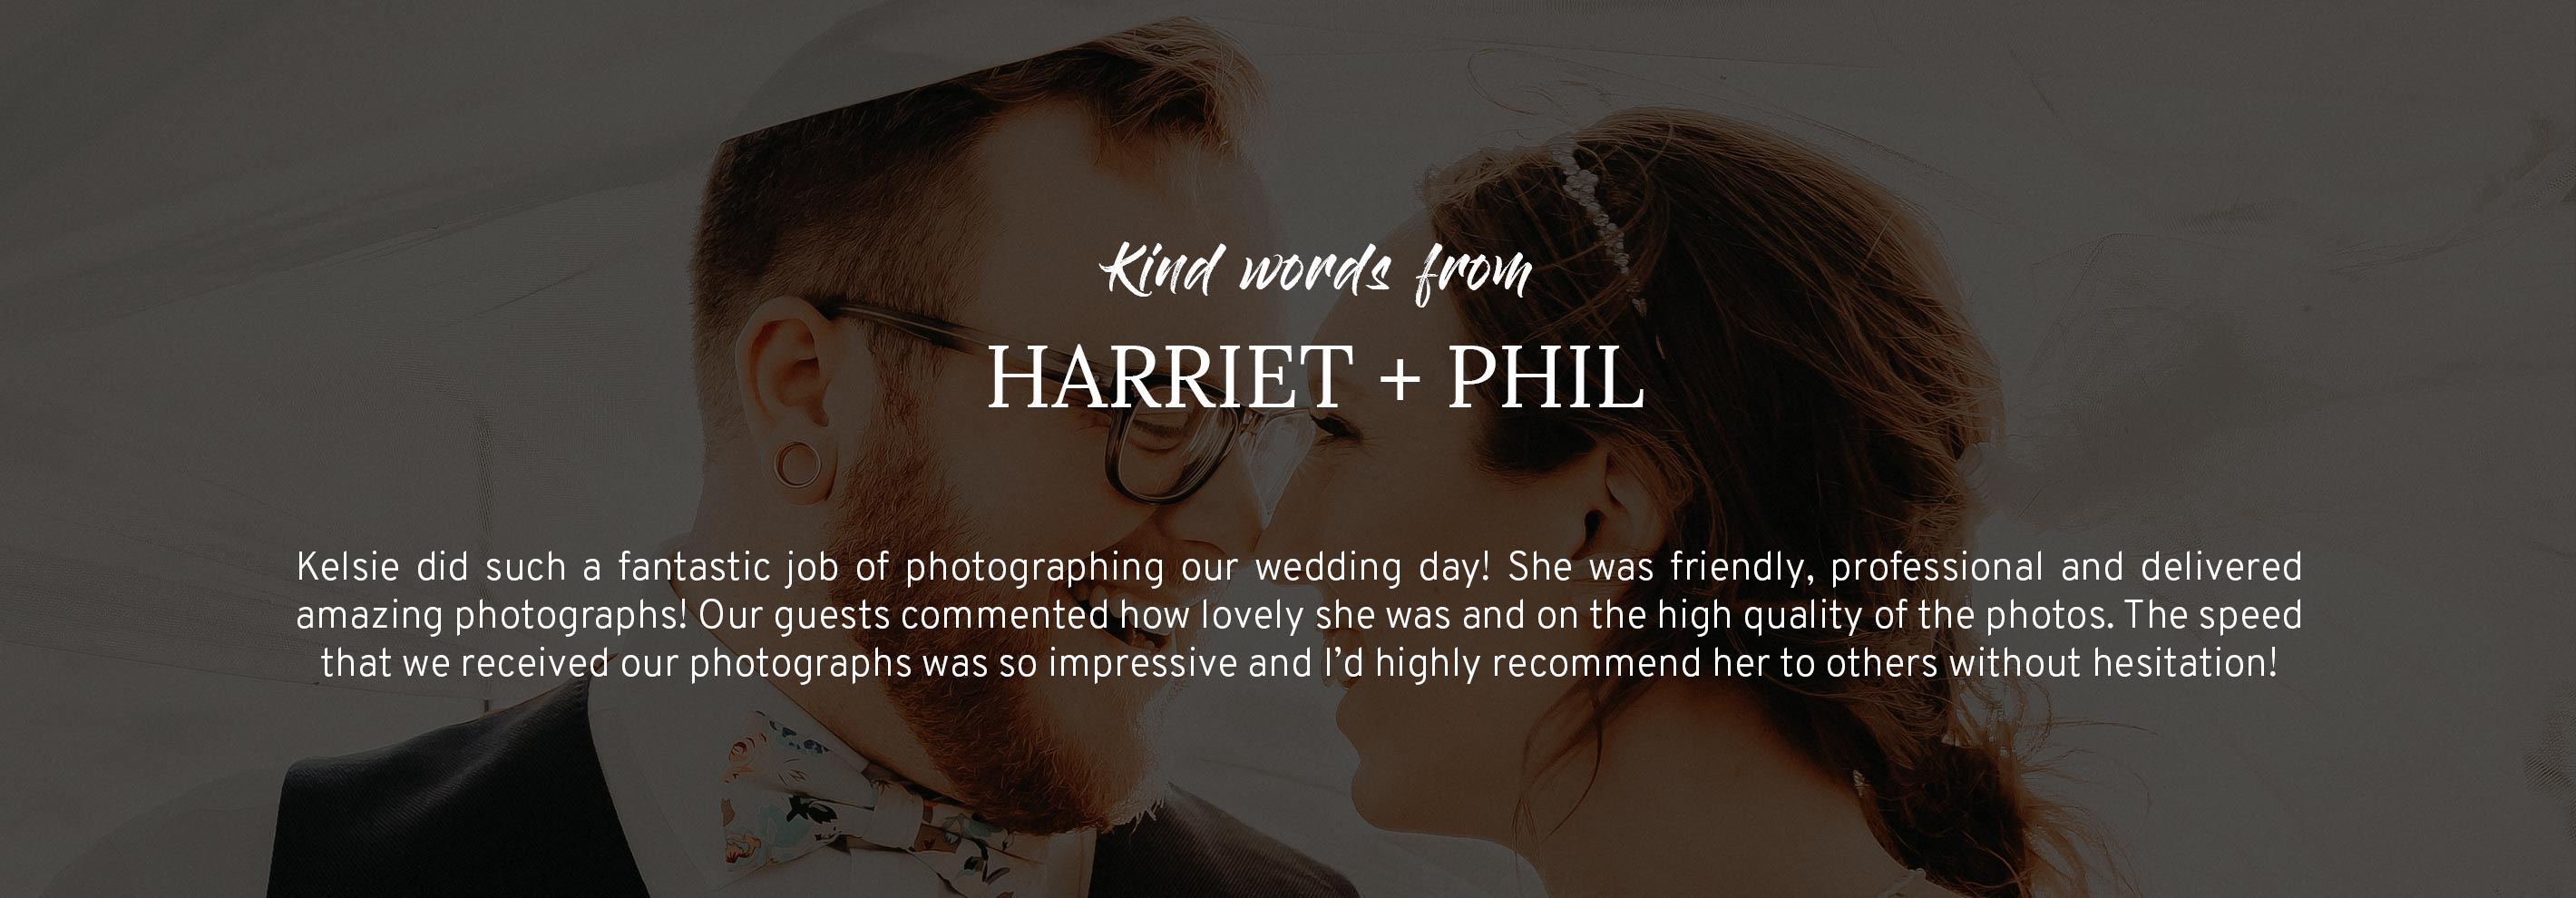 essex-wedding-photographer-testimonial